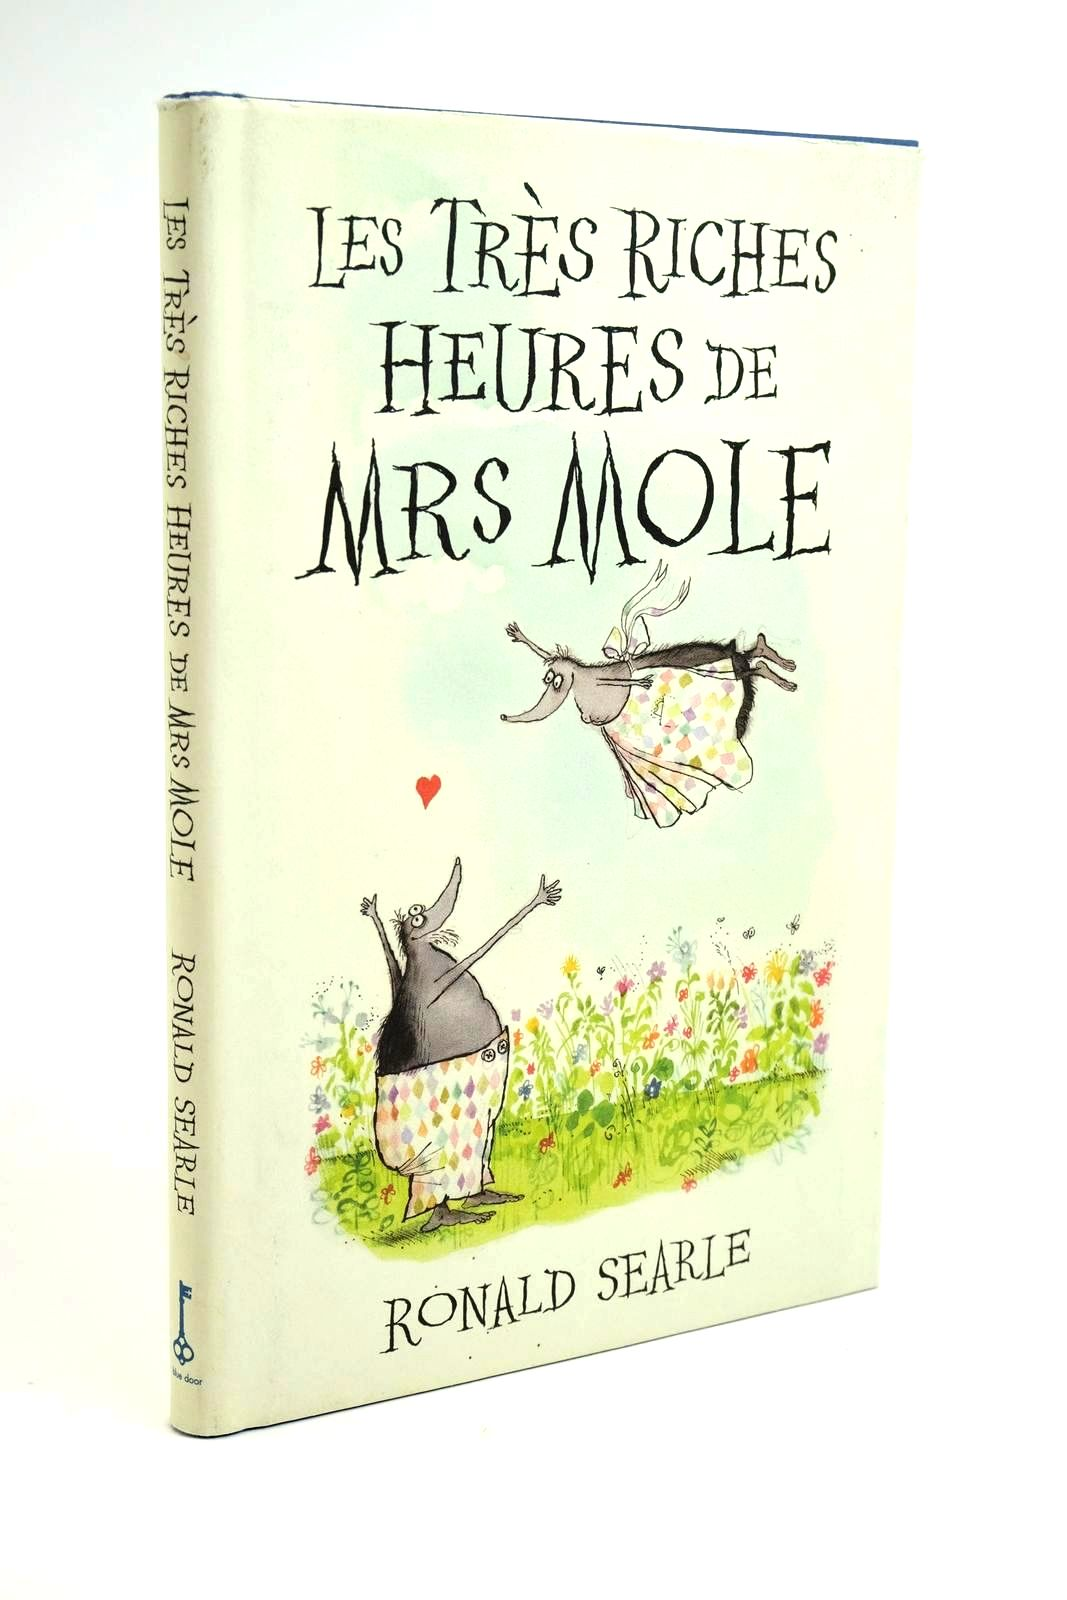 Photo of LE TRES RICHES HEURES DE MRS MOLE- Stock Number: 1321671